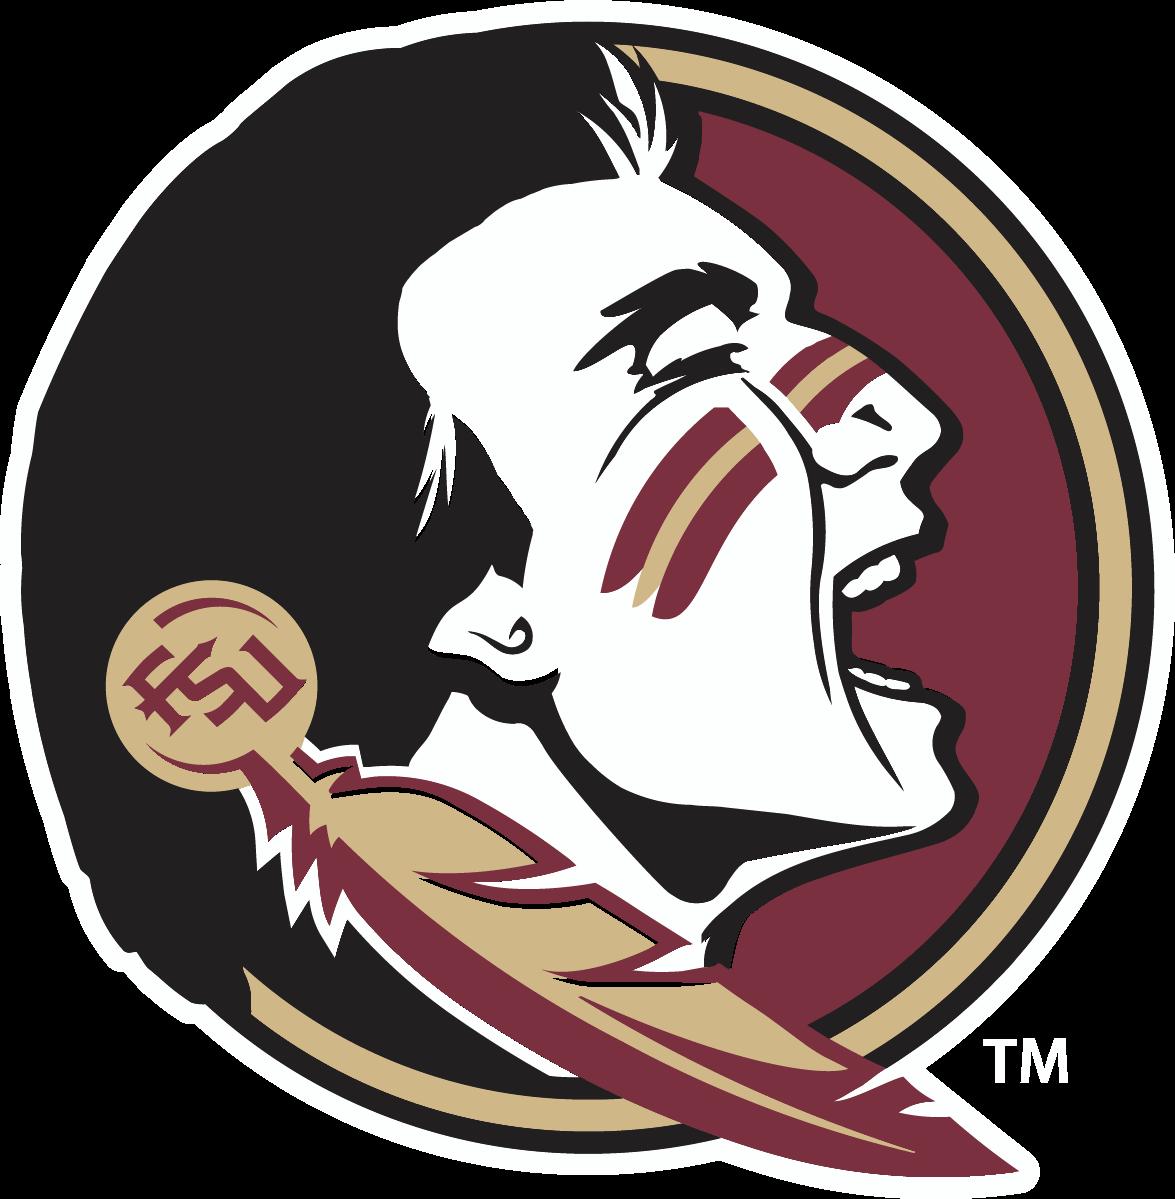 FSU Logo (Florida State Seminoles) png